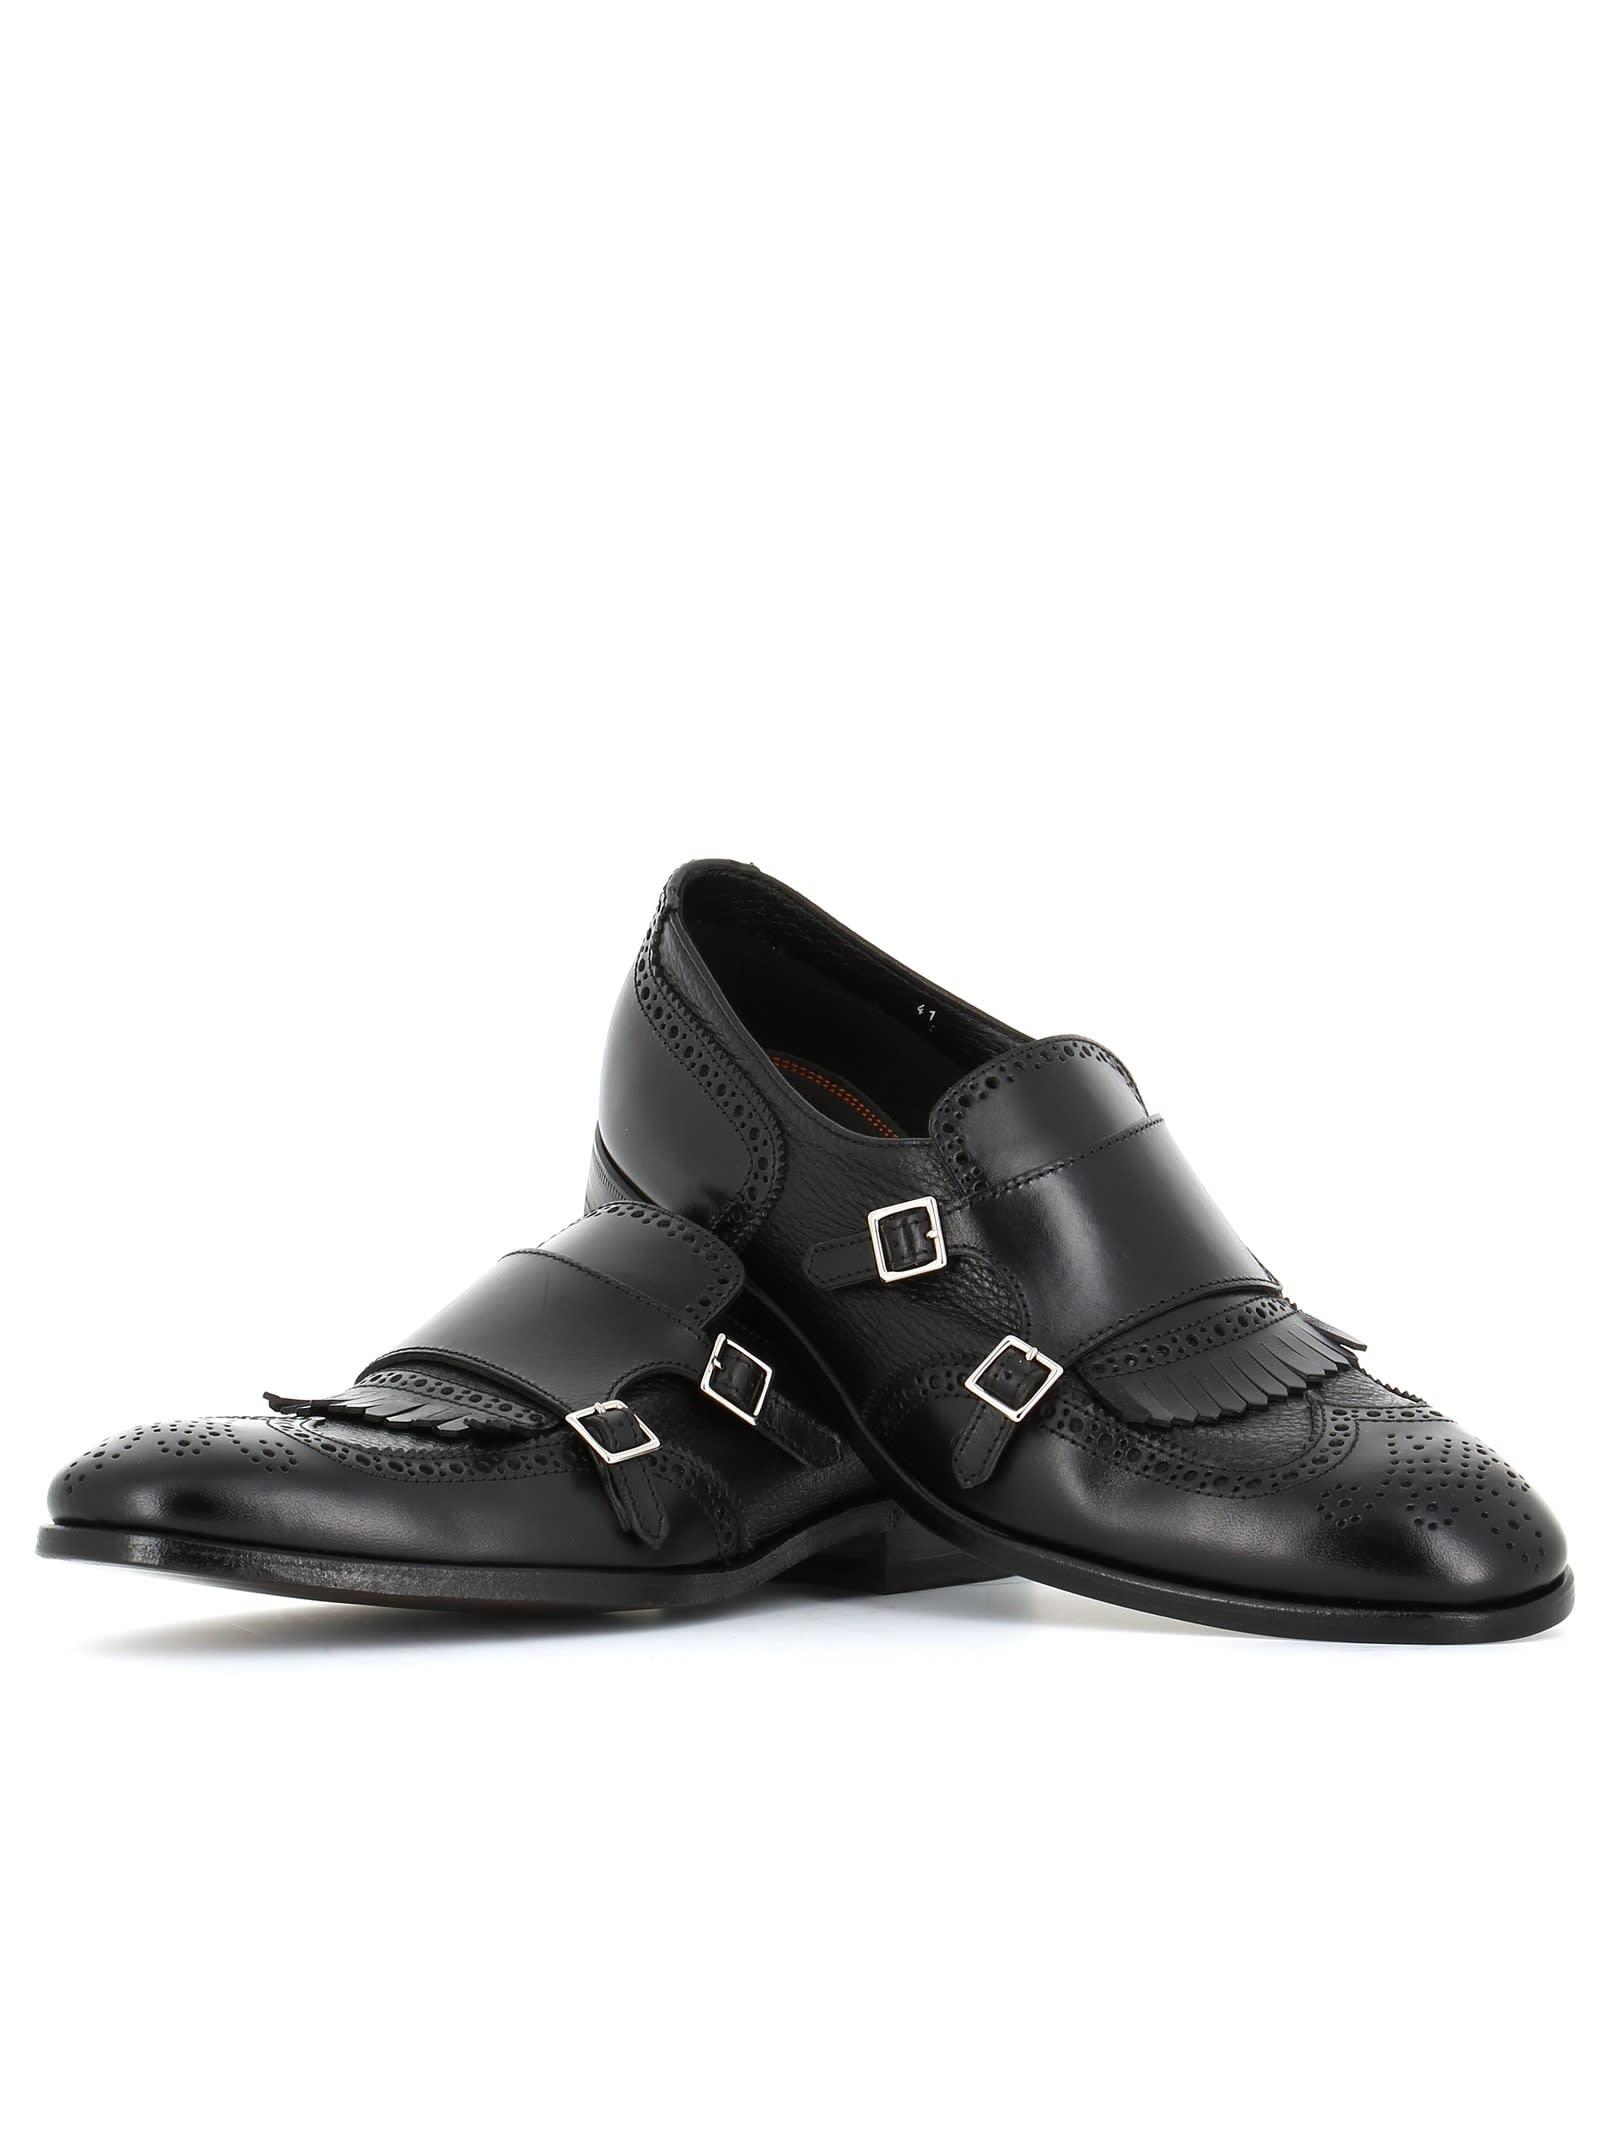 Henderson Baracco Henderson Baracco Monk Shoes 67426.8